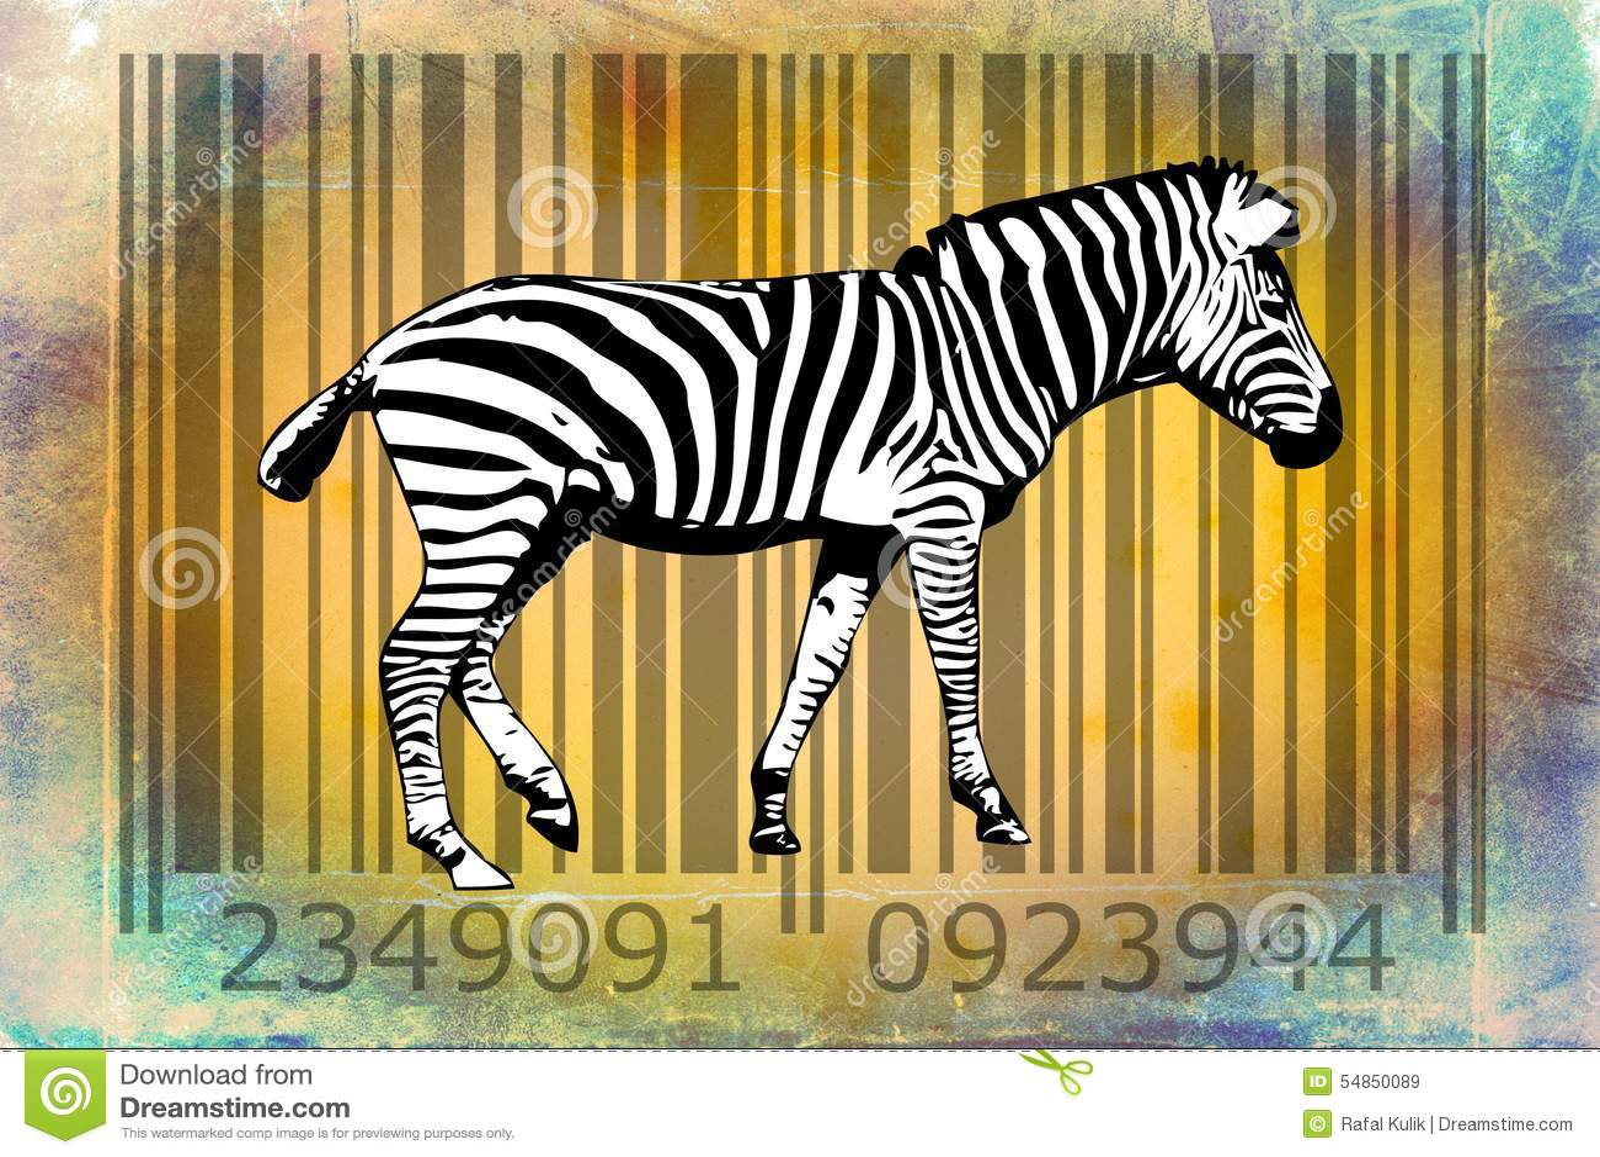 Zebra Barcode Animal Design Art Idea Stock Illustration